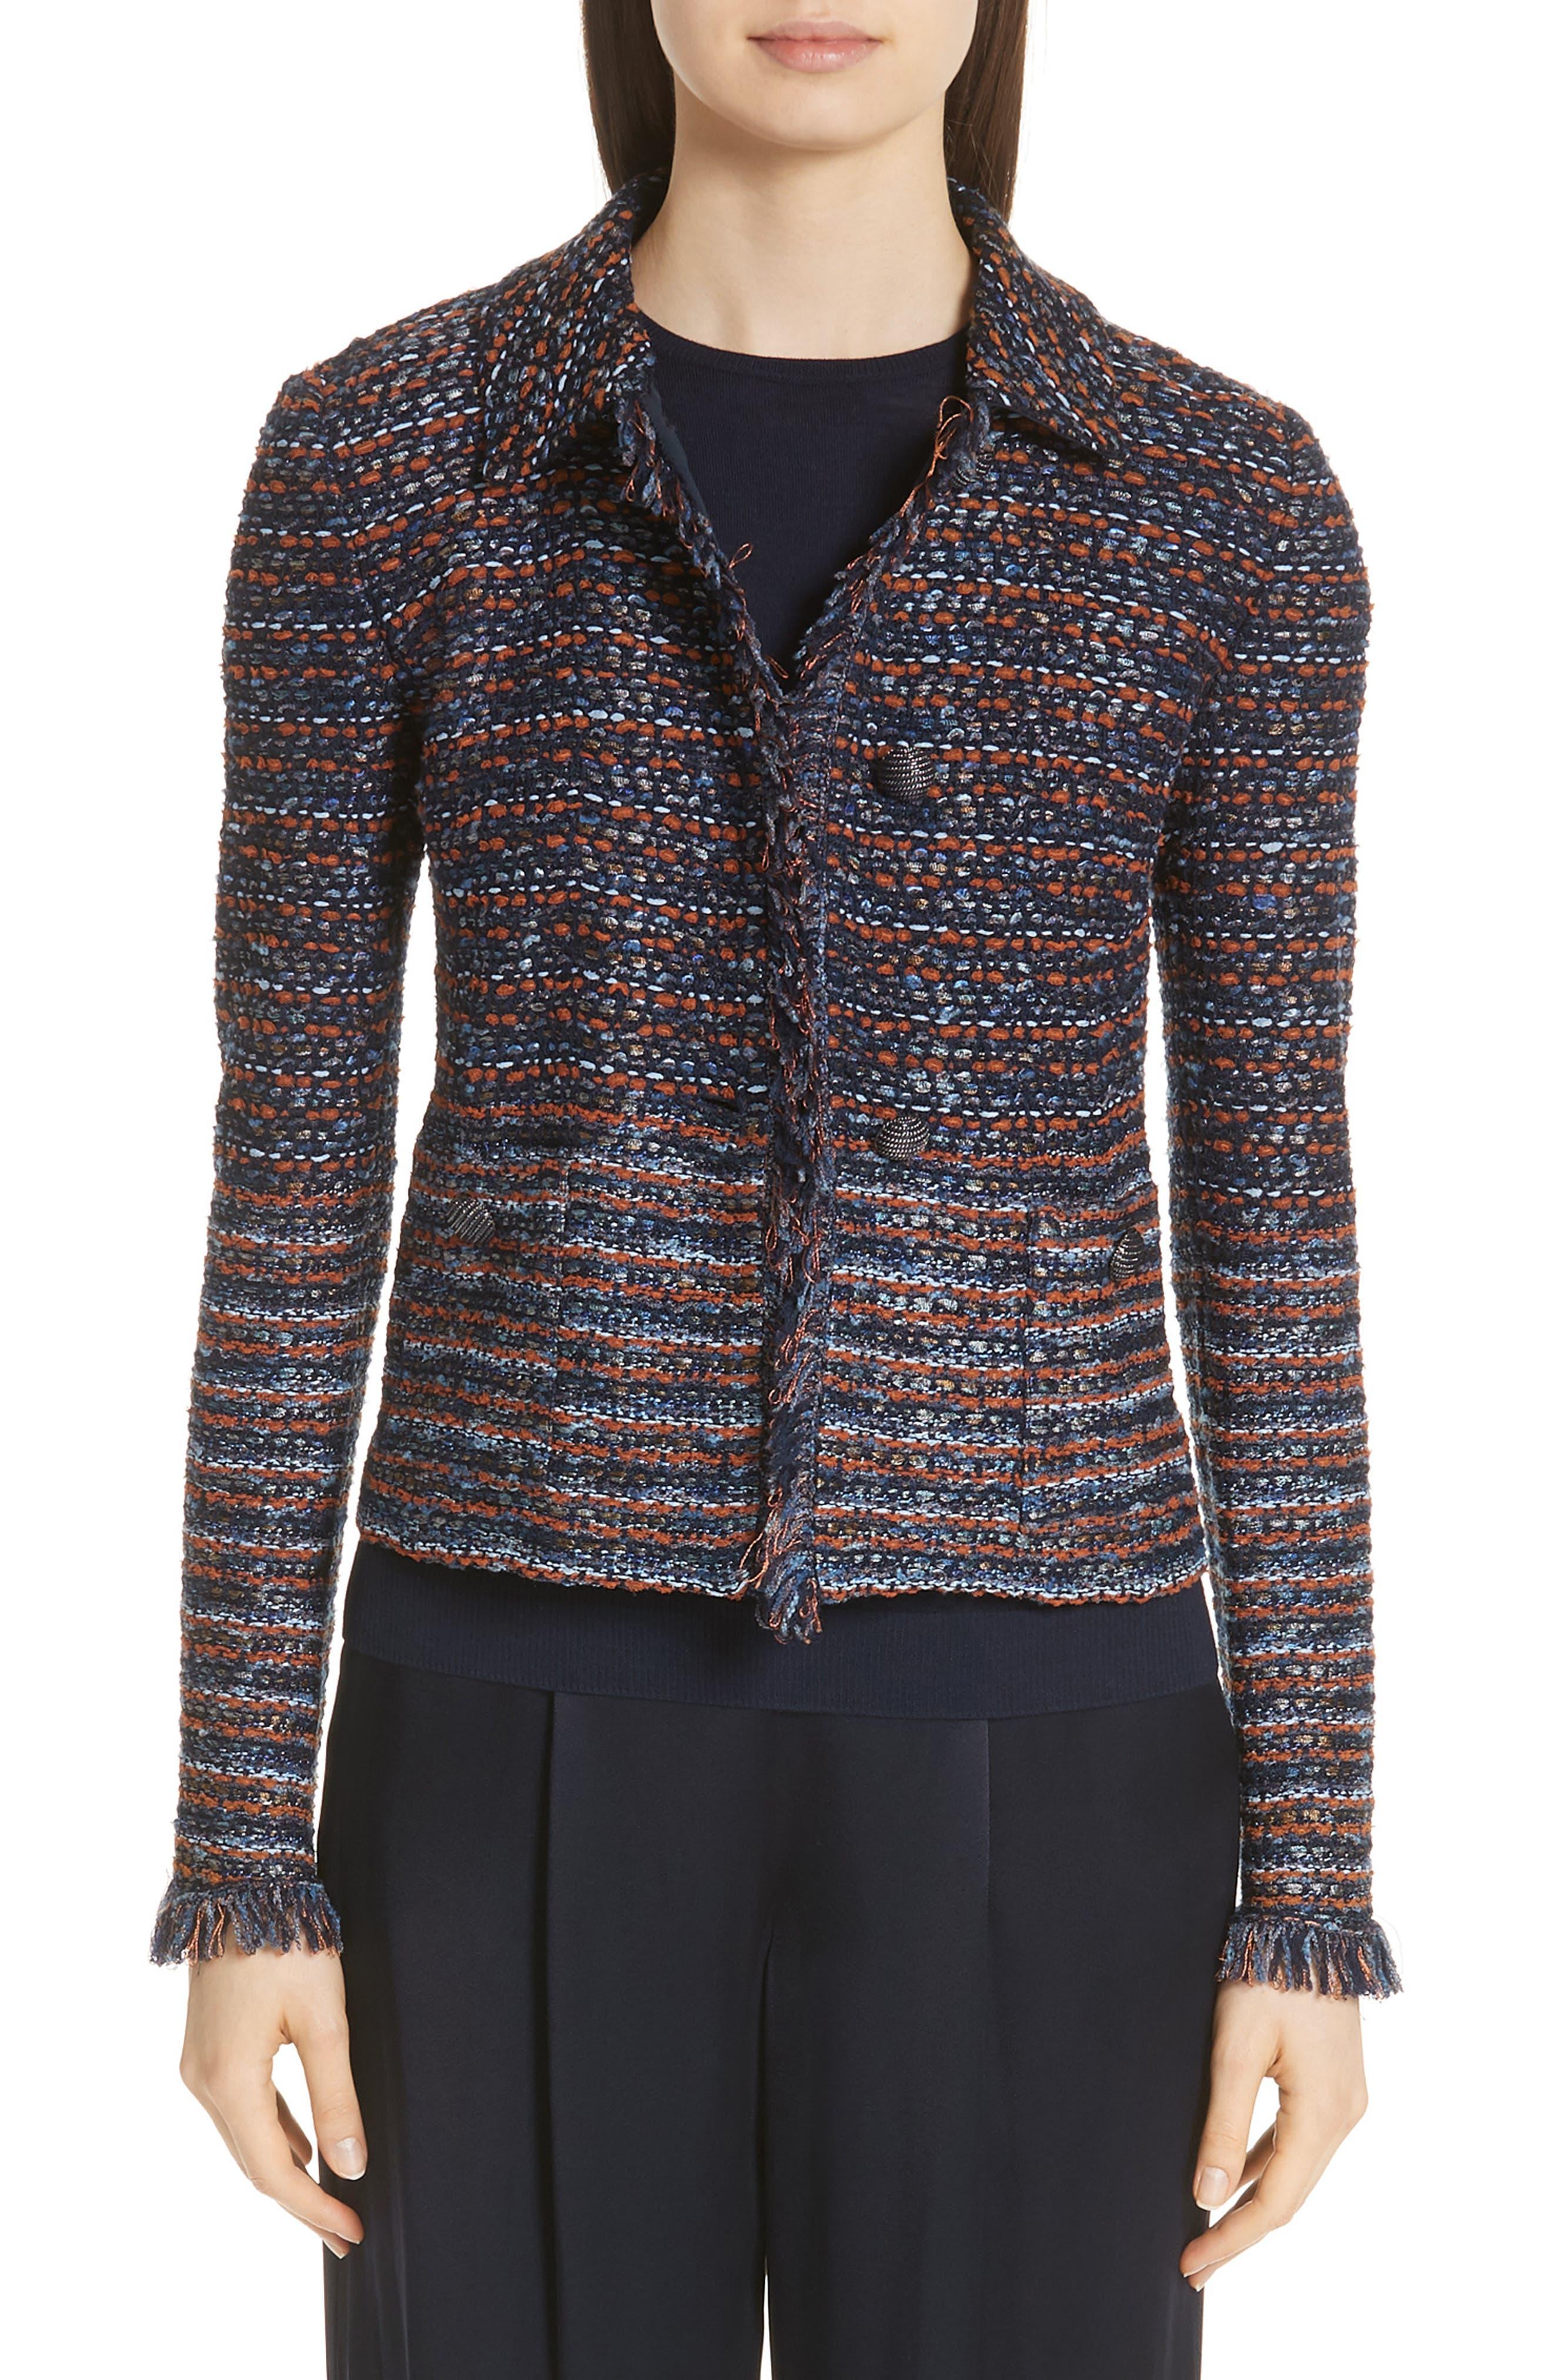 ST. JOHN Ombre Ribbon Knit Fringe Jacket in Navy/ Copper Multi